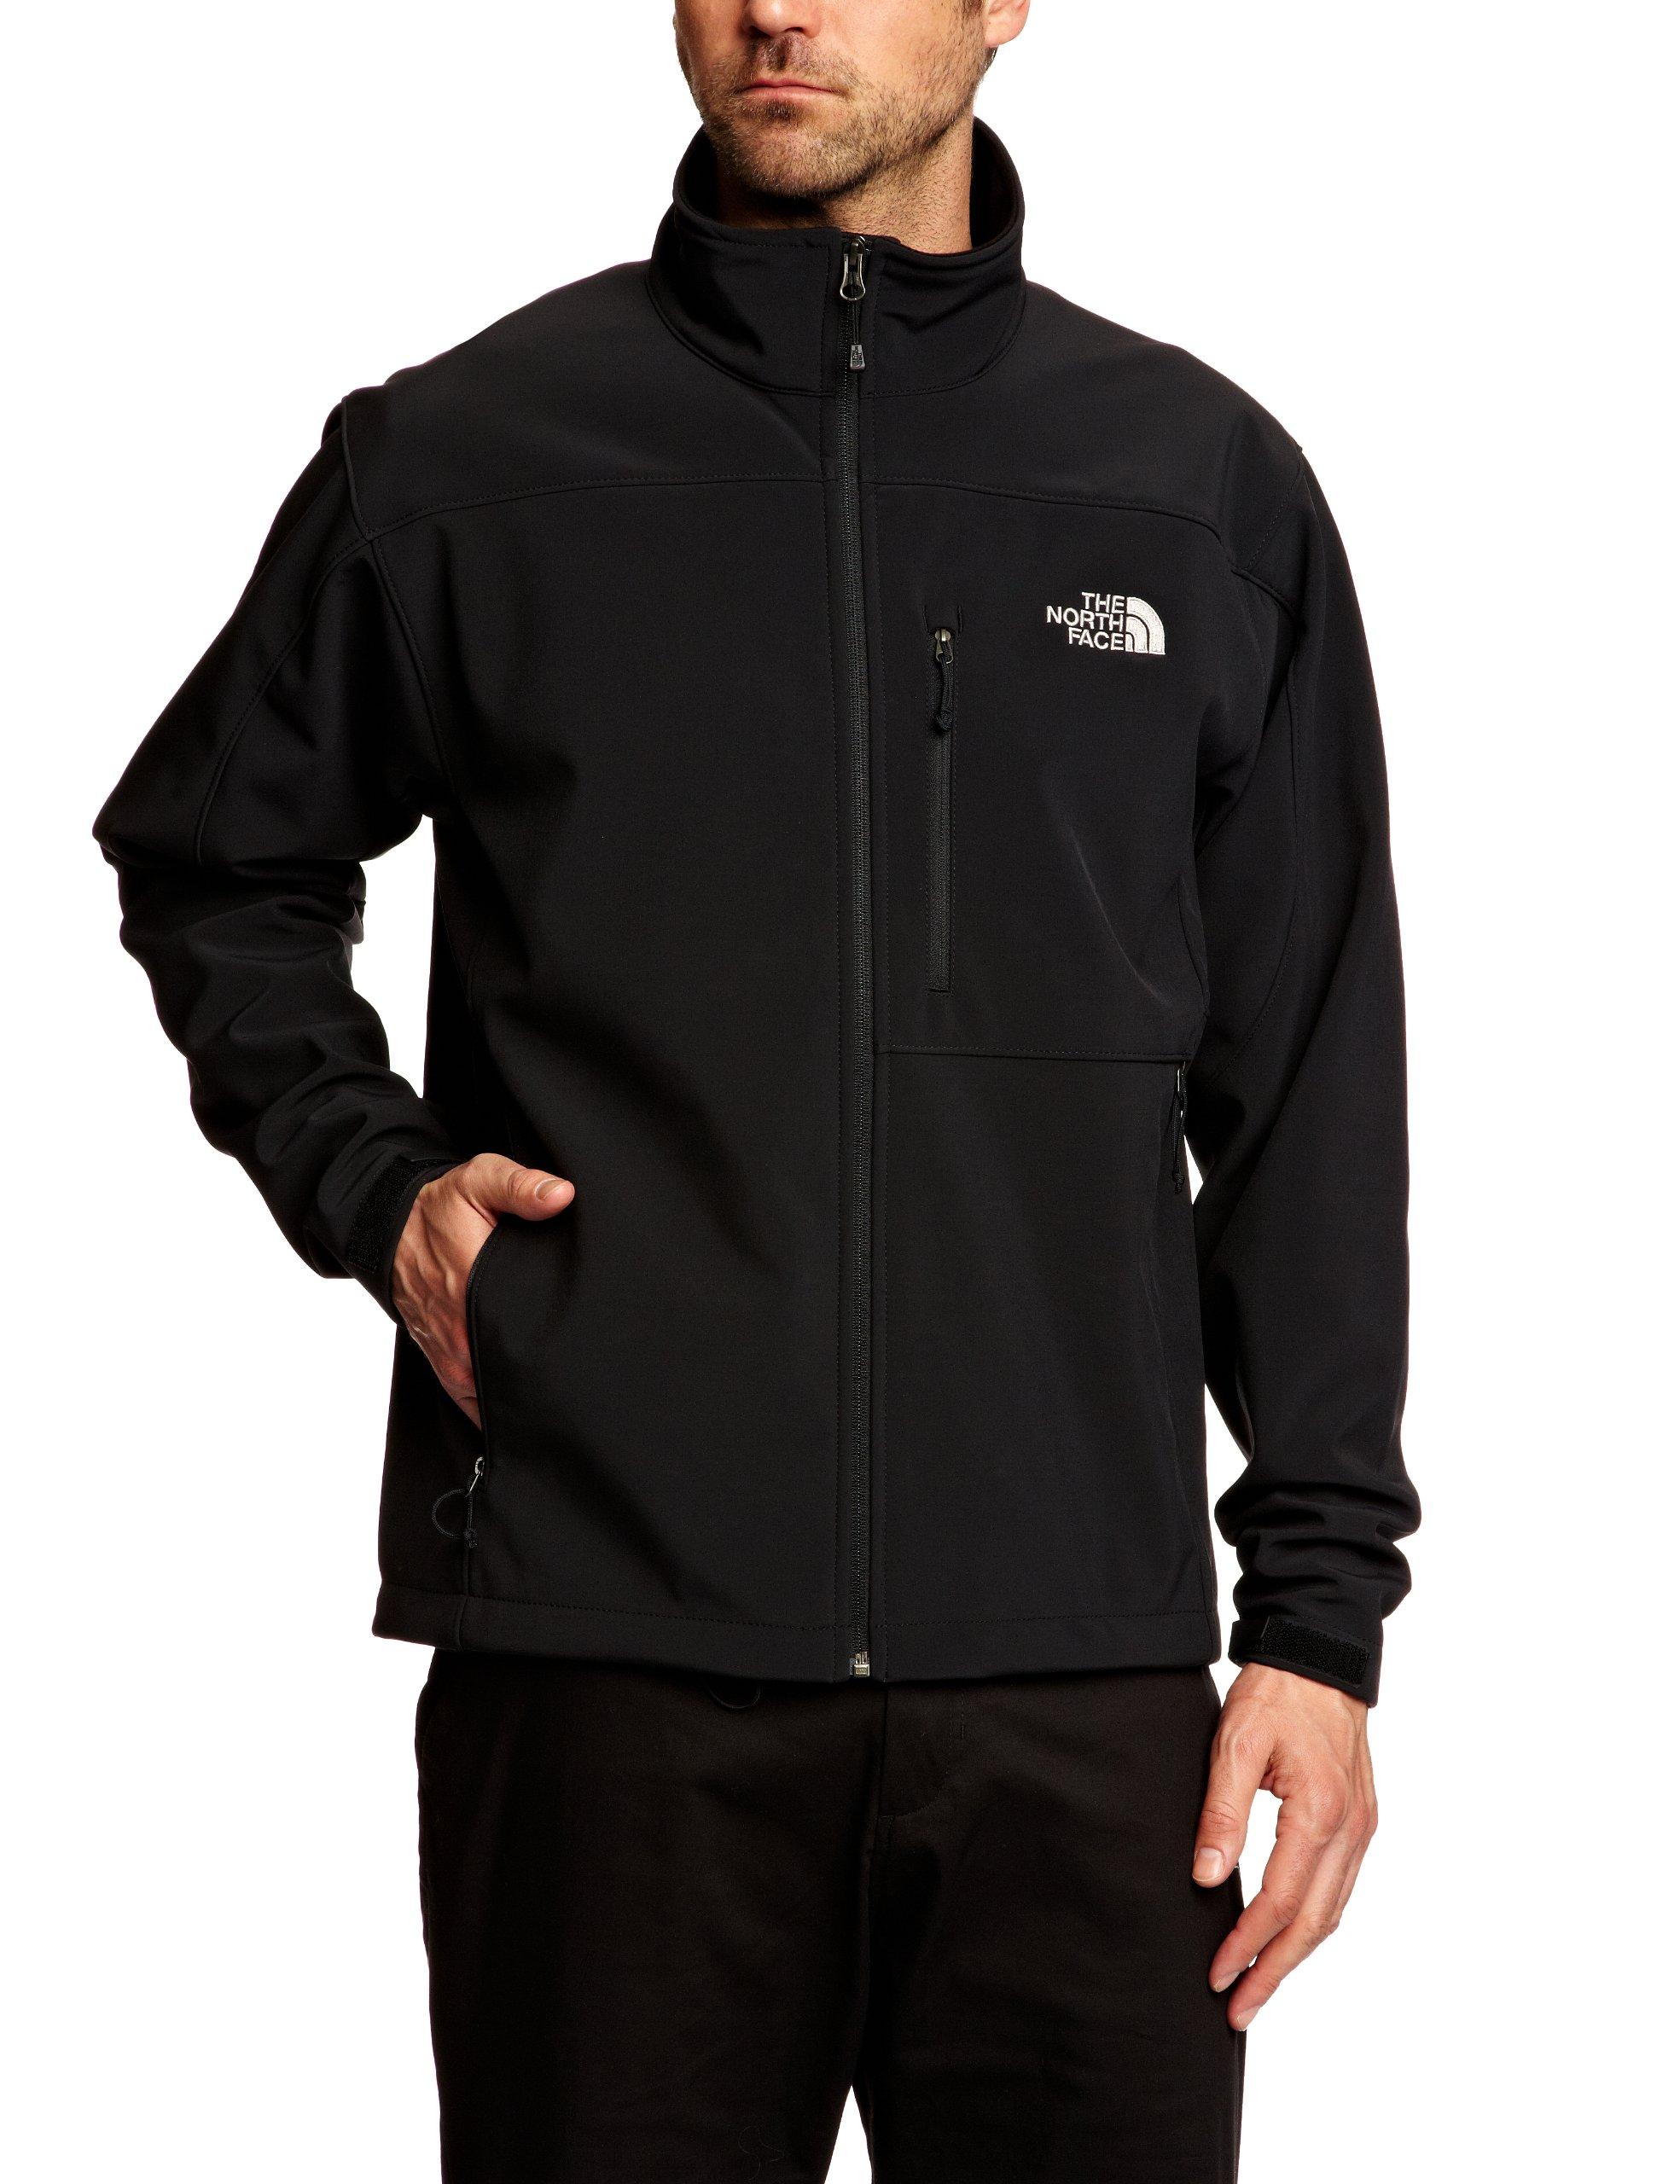 2f0852c9b free shipping he north face apex bionic full zip jacket 51523 da6b9